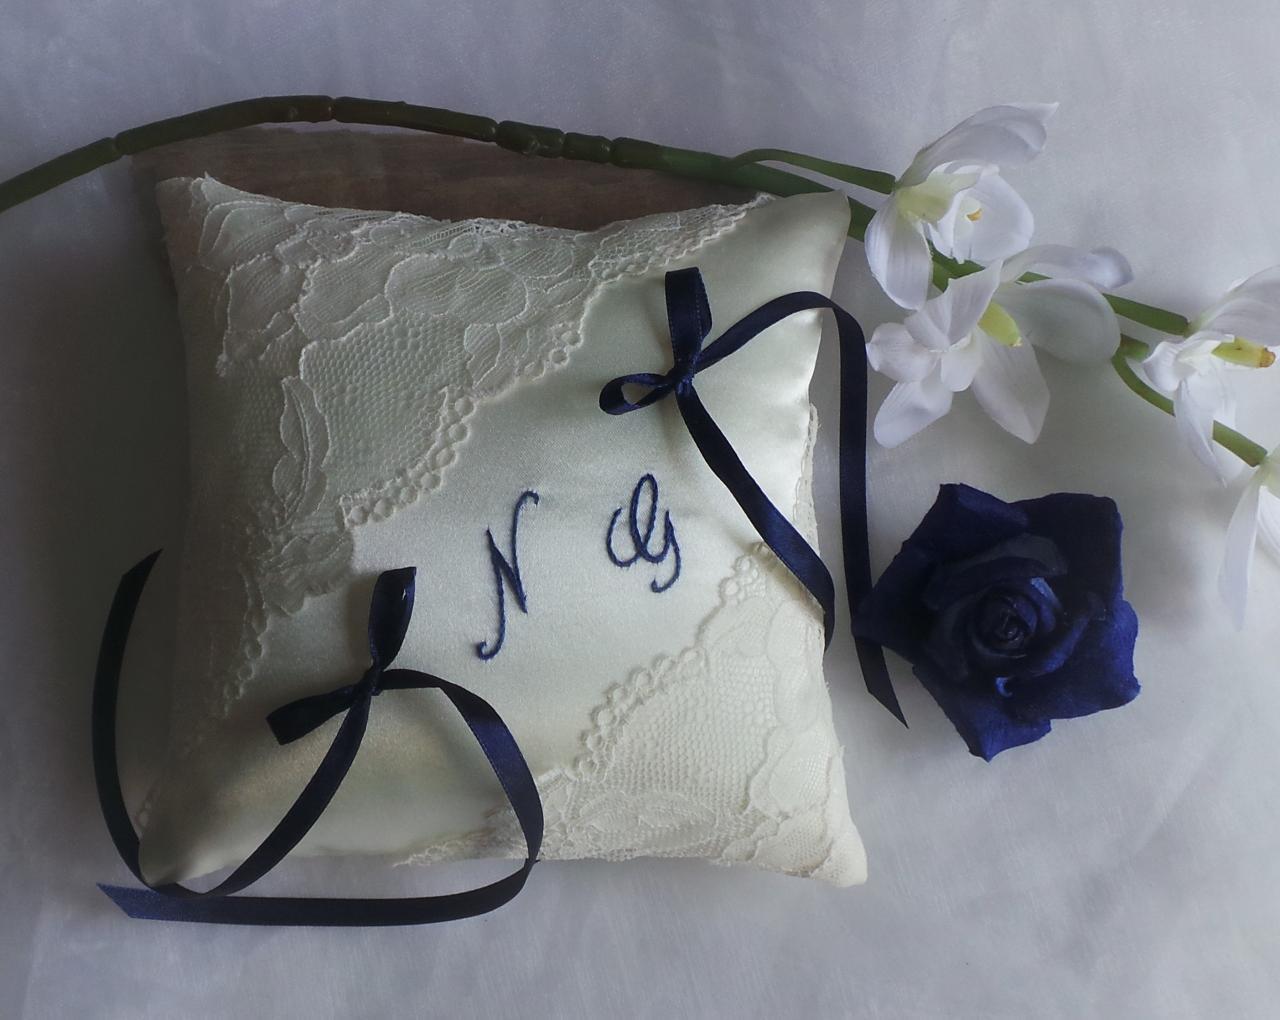 Coussin porte alliance dentelle ivoire bleu marine